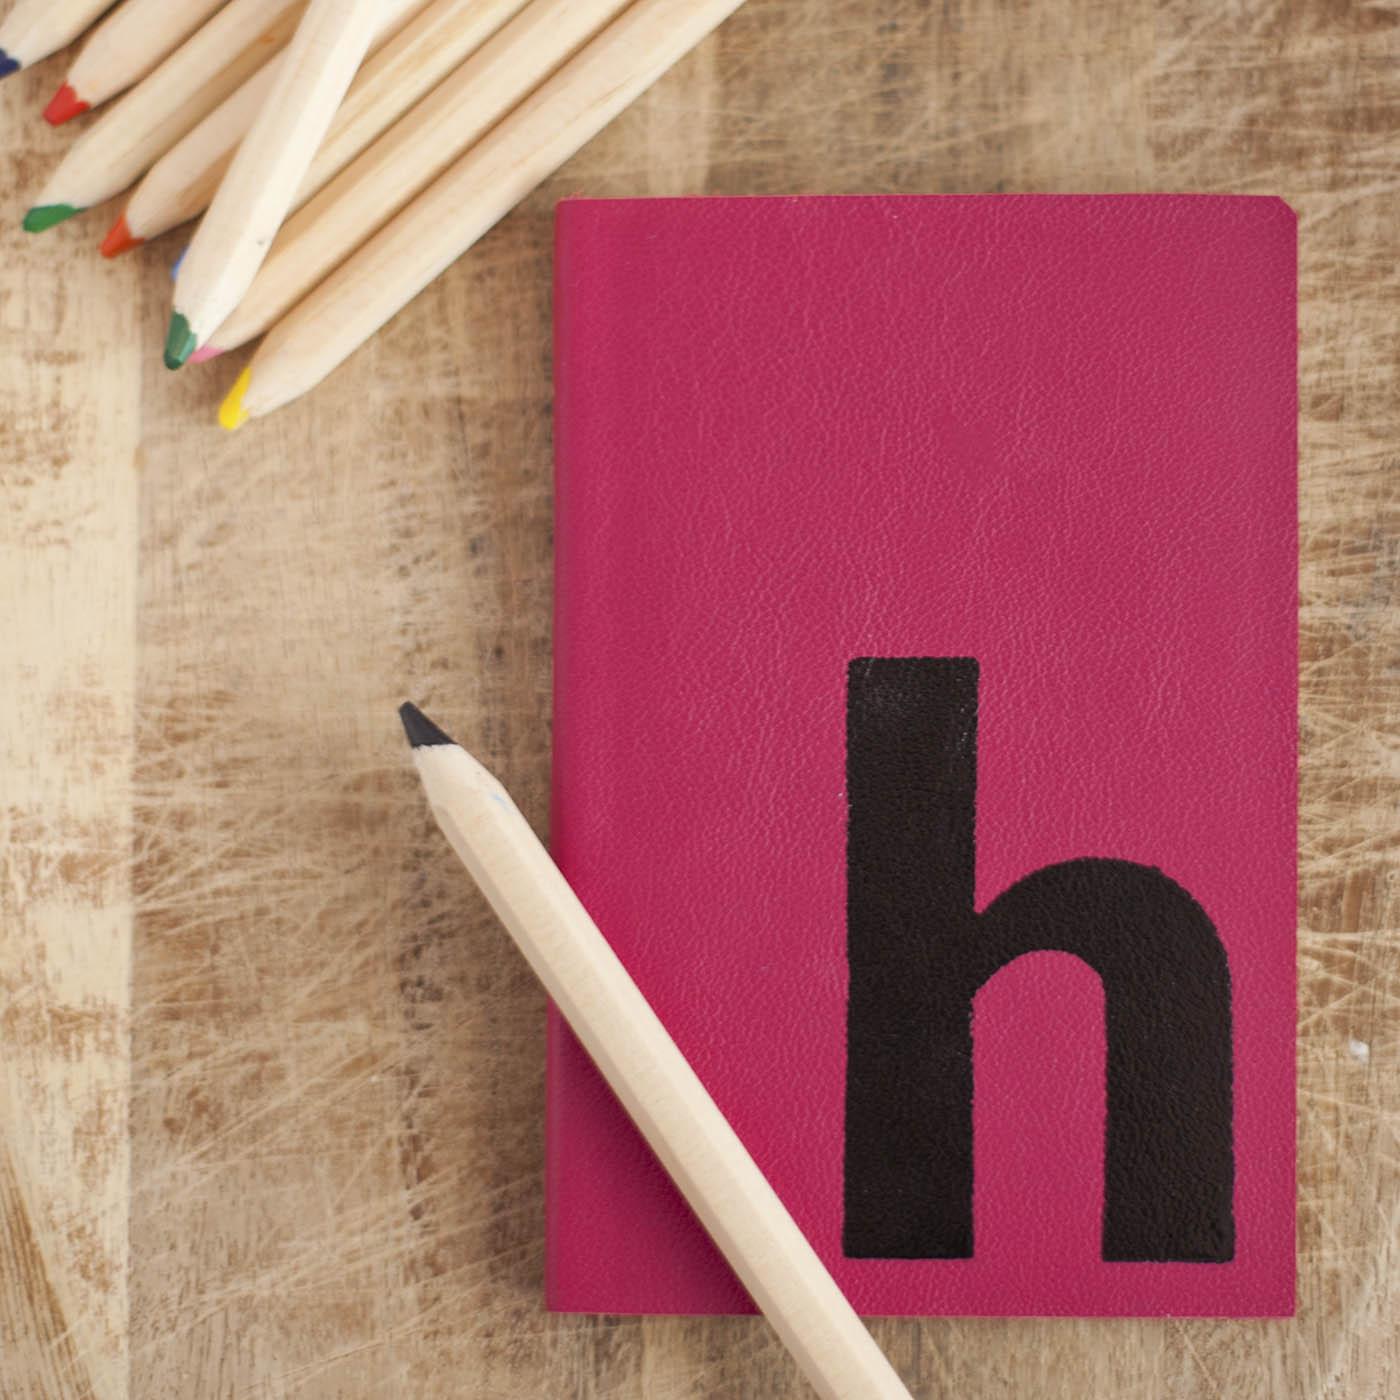 hw1xovwn-ti-hope-house-press